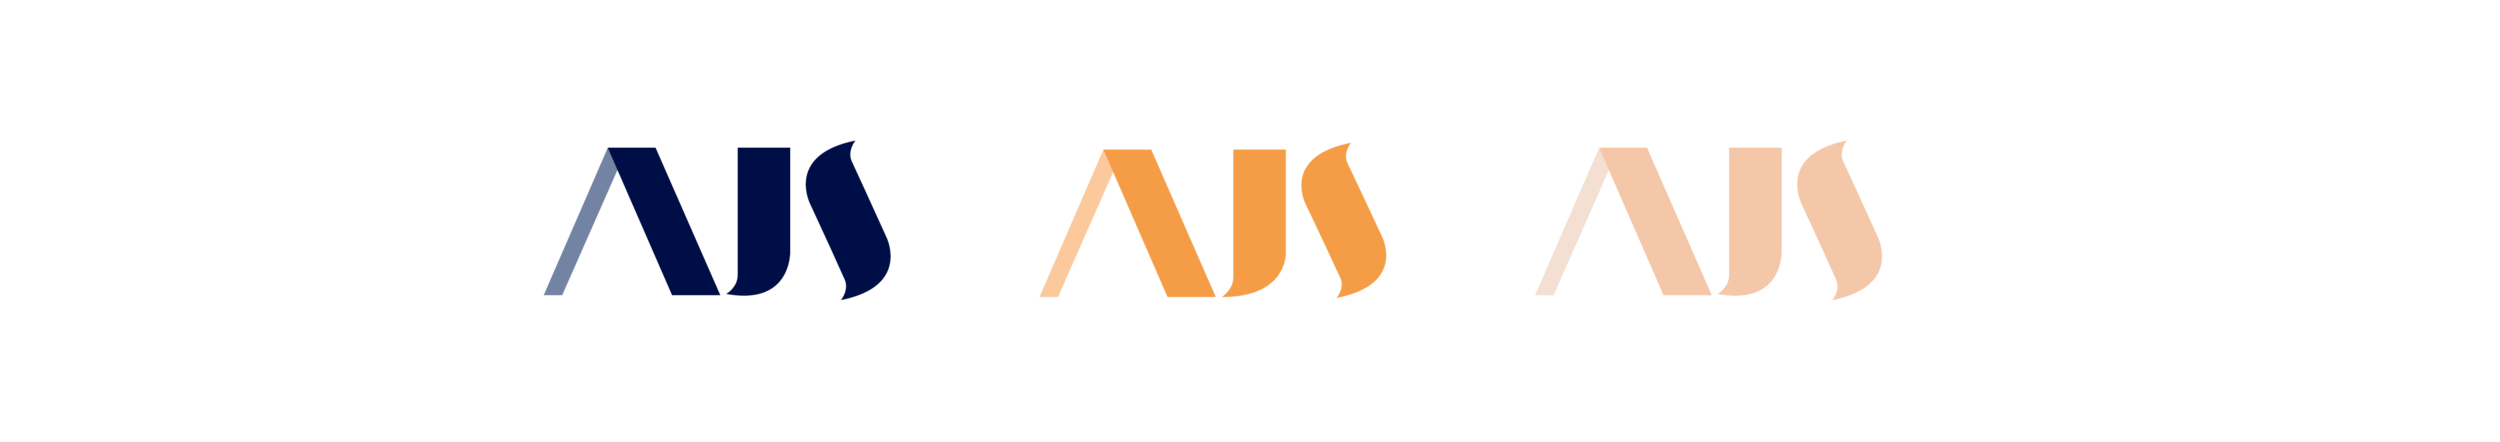 AJS_Chosen_Mark_ForArtwork-02.png